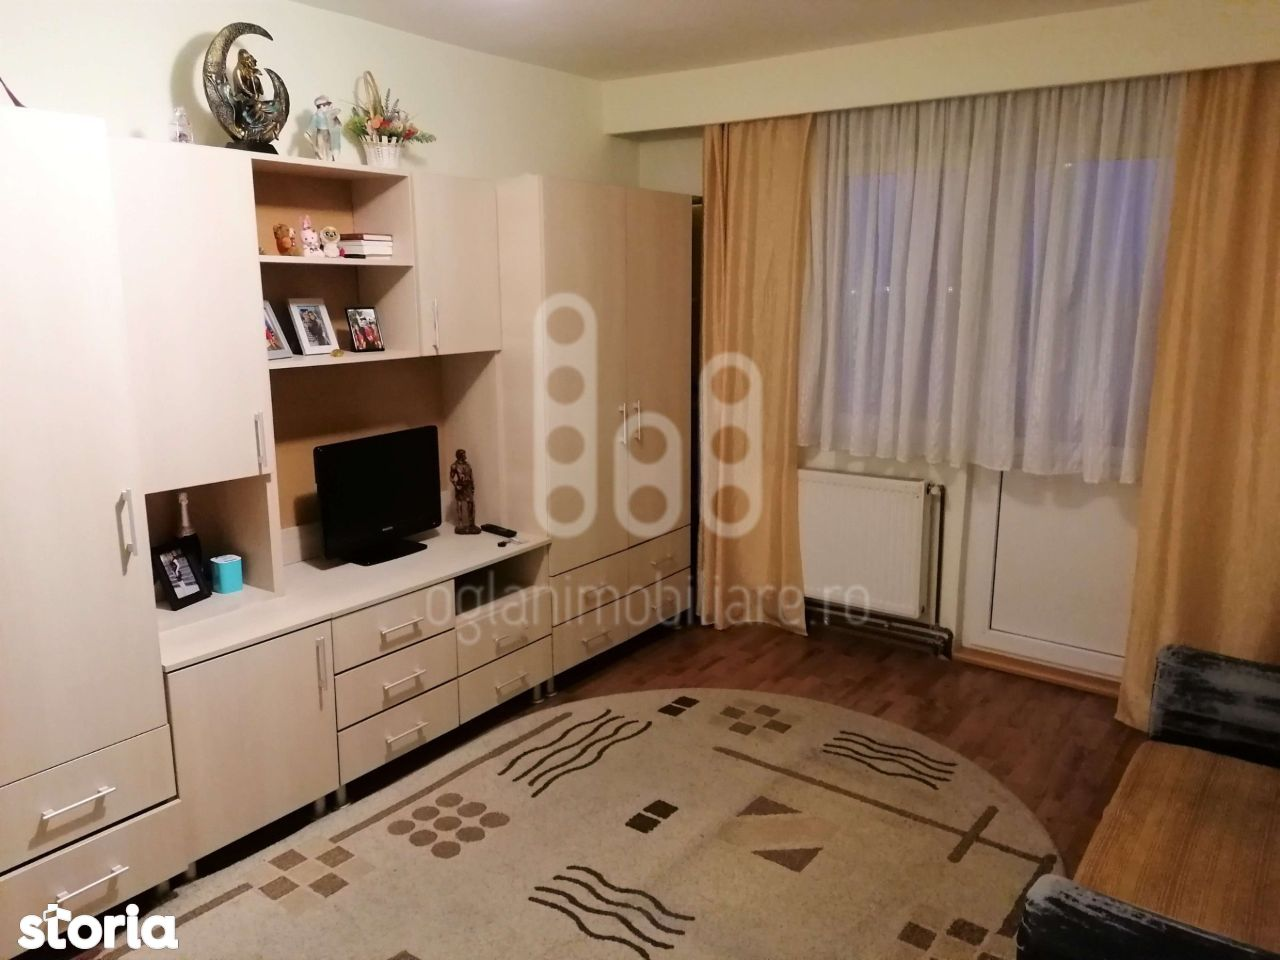 Apartament 2 camere semideomandat cu boxa la subsol, Vasile Aaron